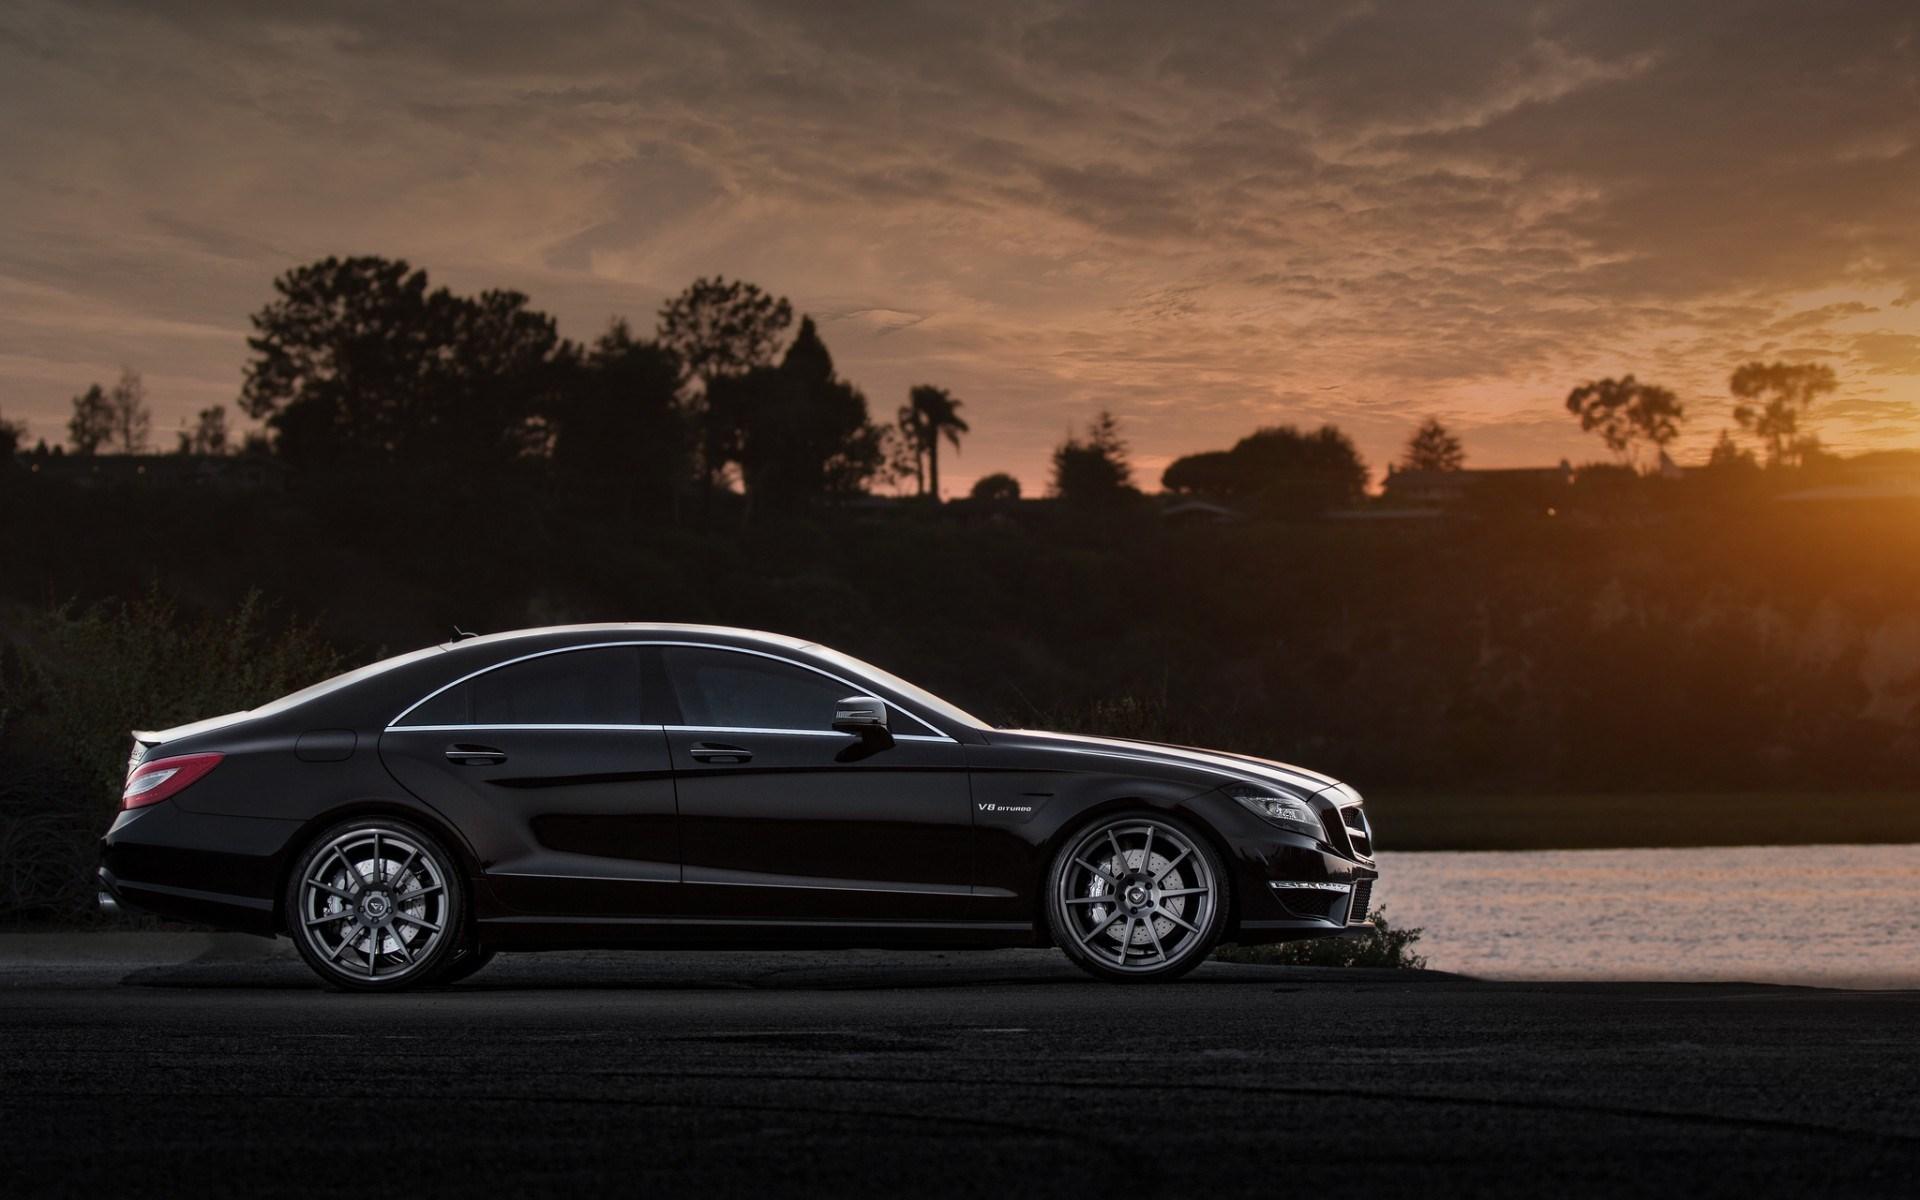 Mercedes-Benz CLS63 AMG Lake